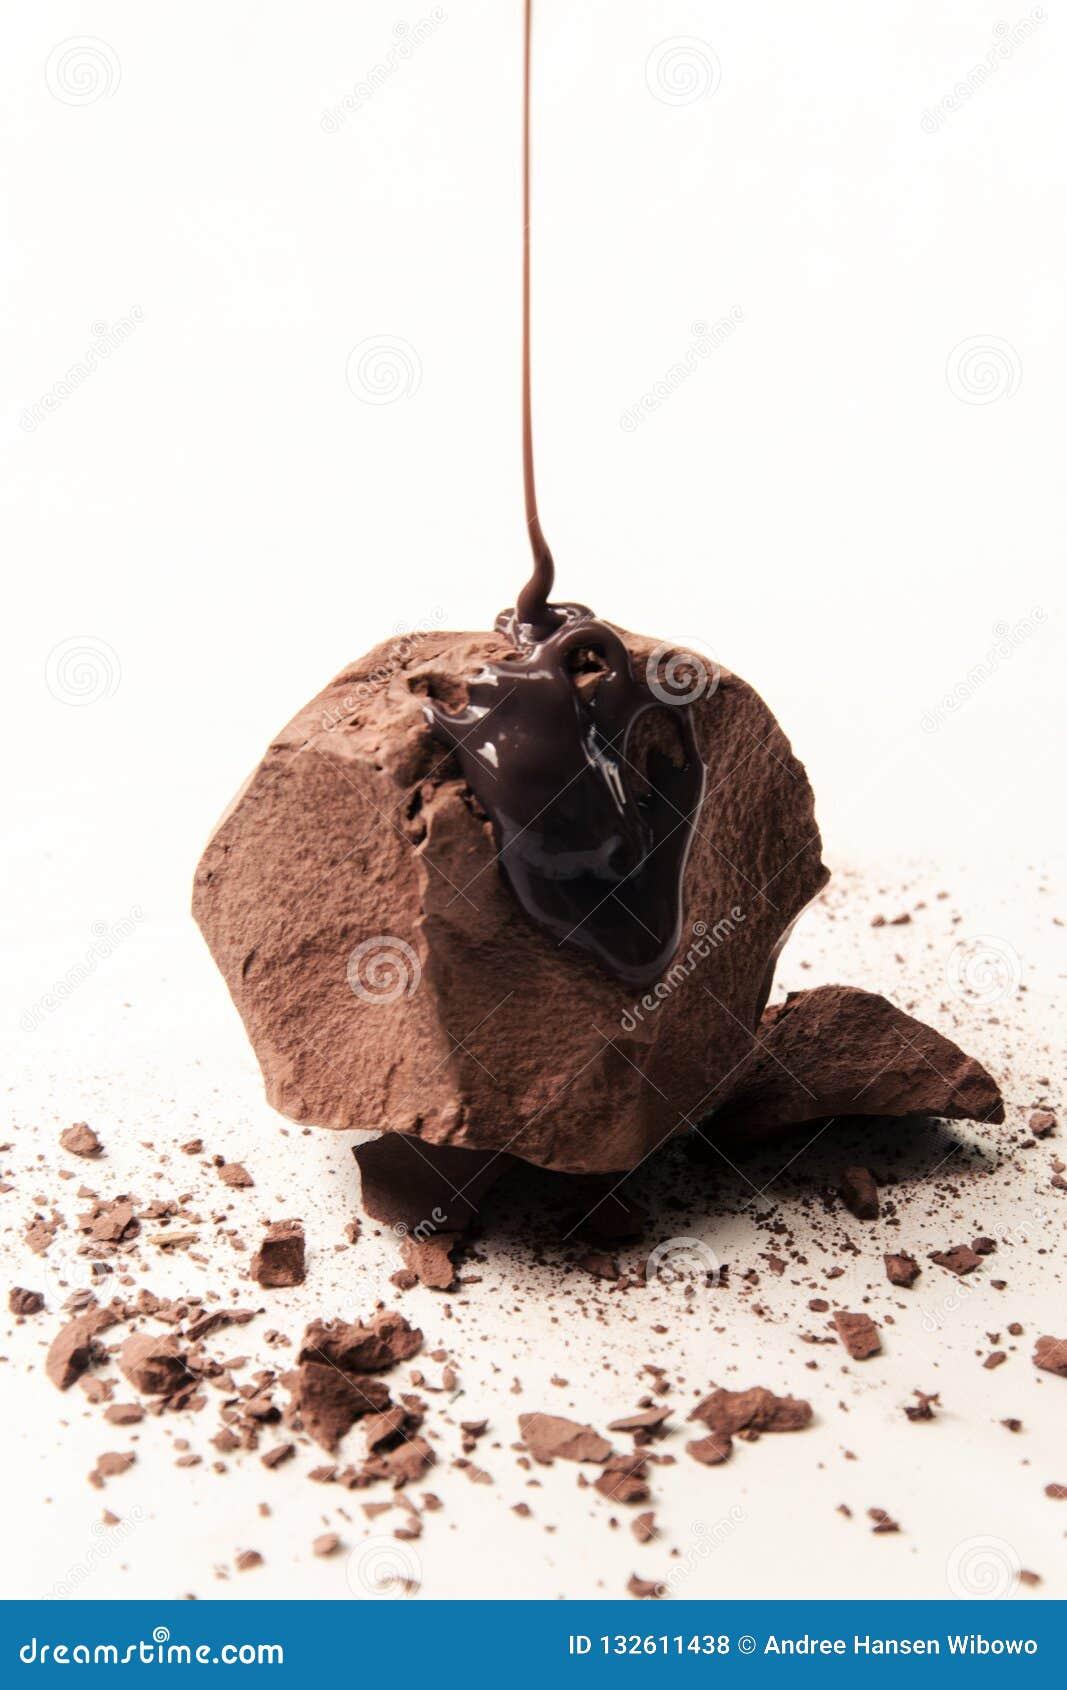 Artisanal Chocolate Truffle with Drizzled Chocolate Sauce